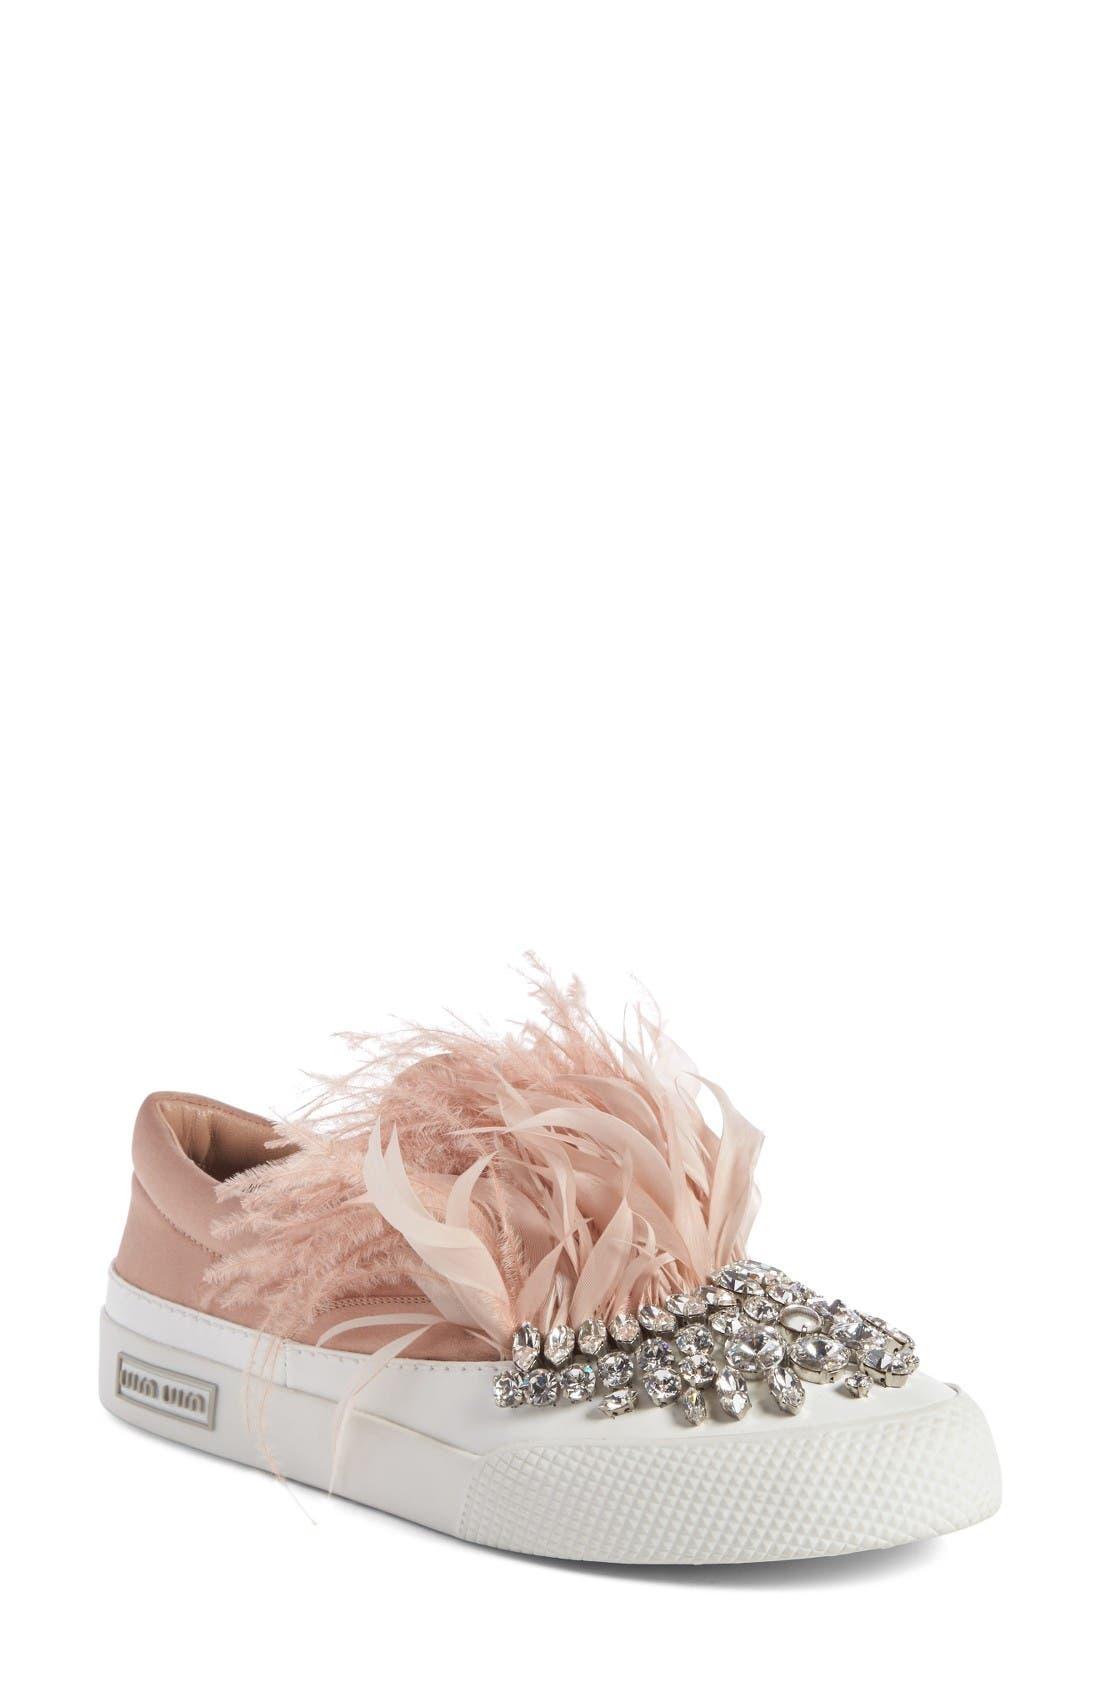 Alternate Image 1 Selected - Miu Miu Embellished Feather Slip-On Sneaker (Women)